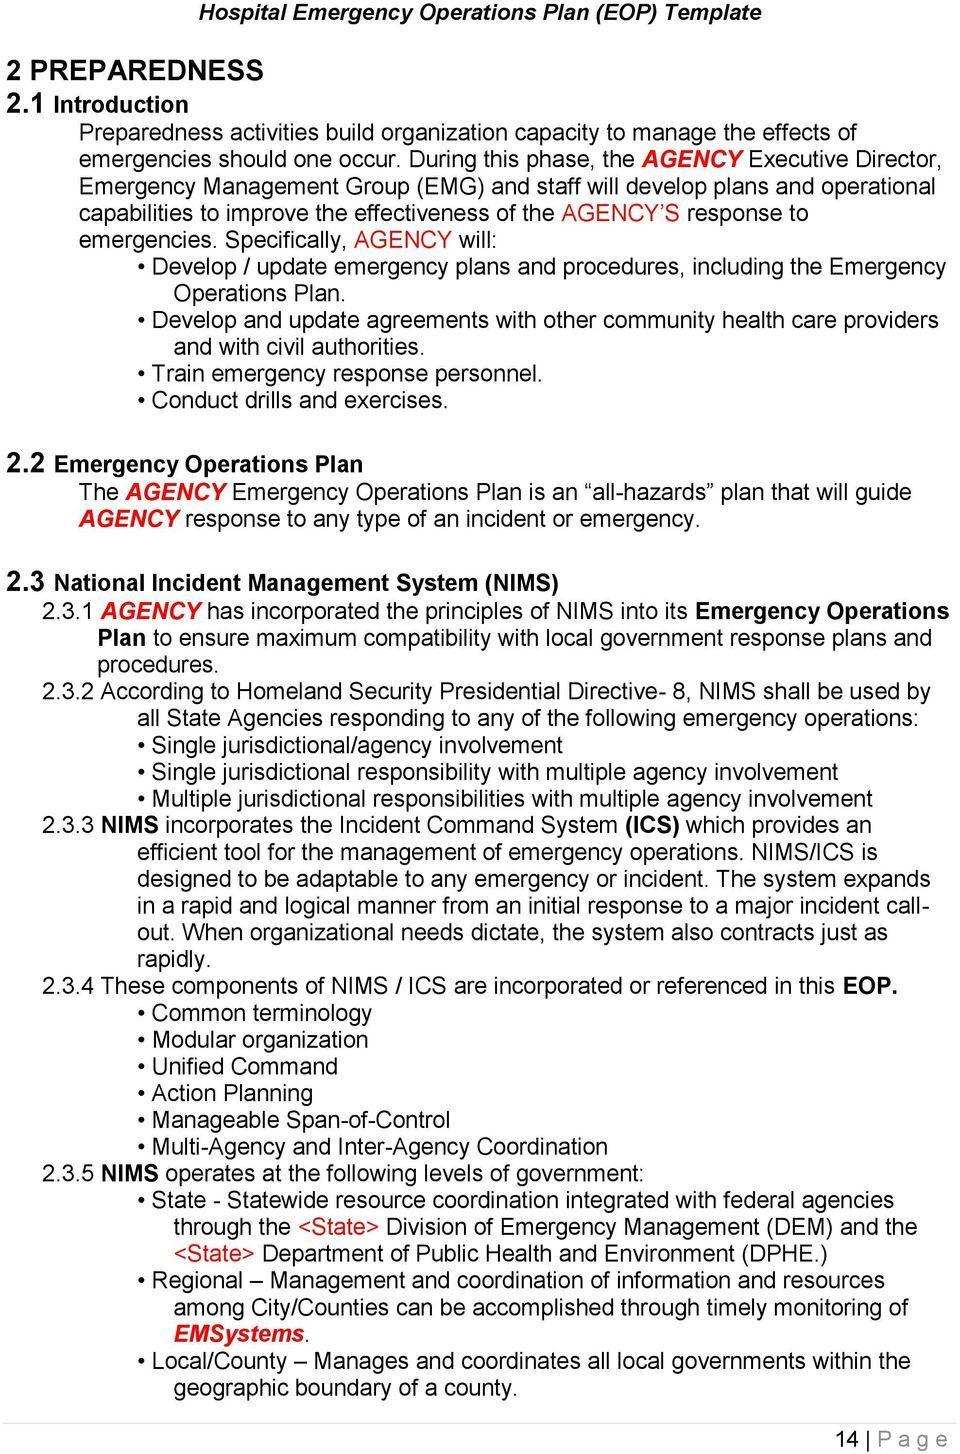 010 Archaicawful Emergency Operation Plan Template High Definition  For Churche Fema BasicFull